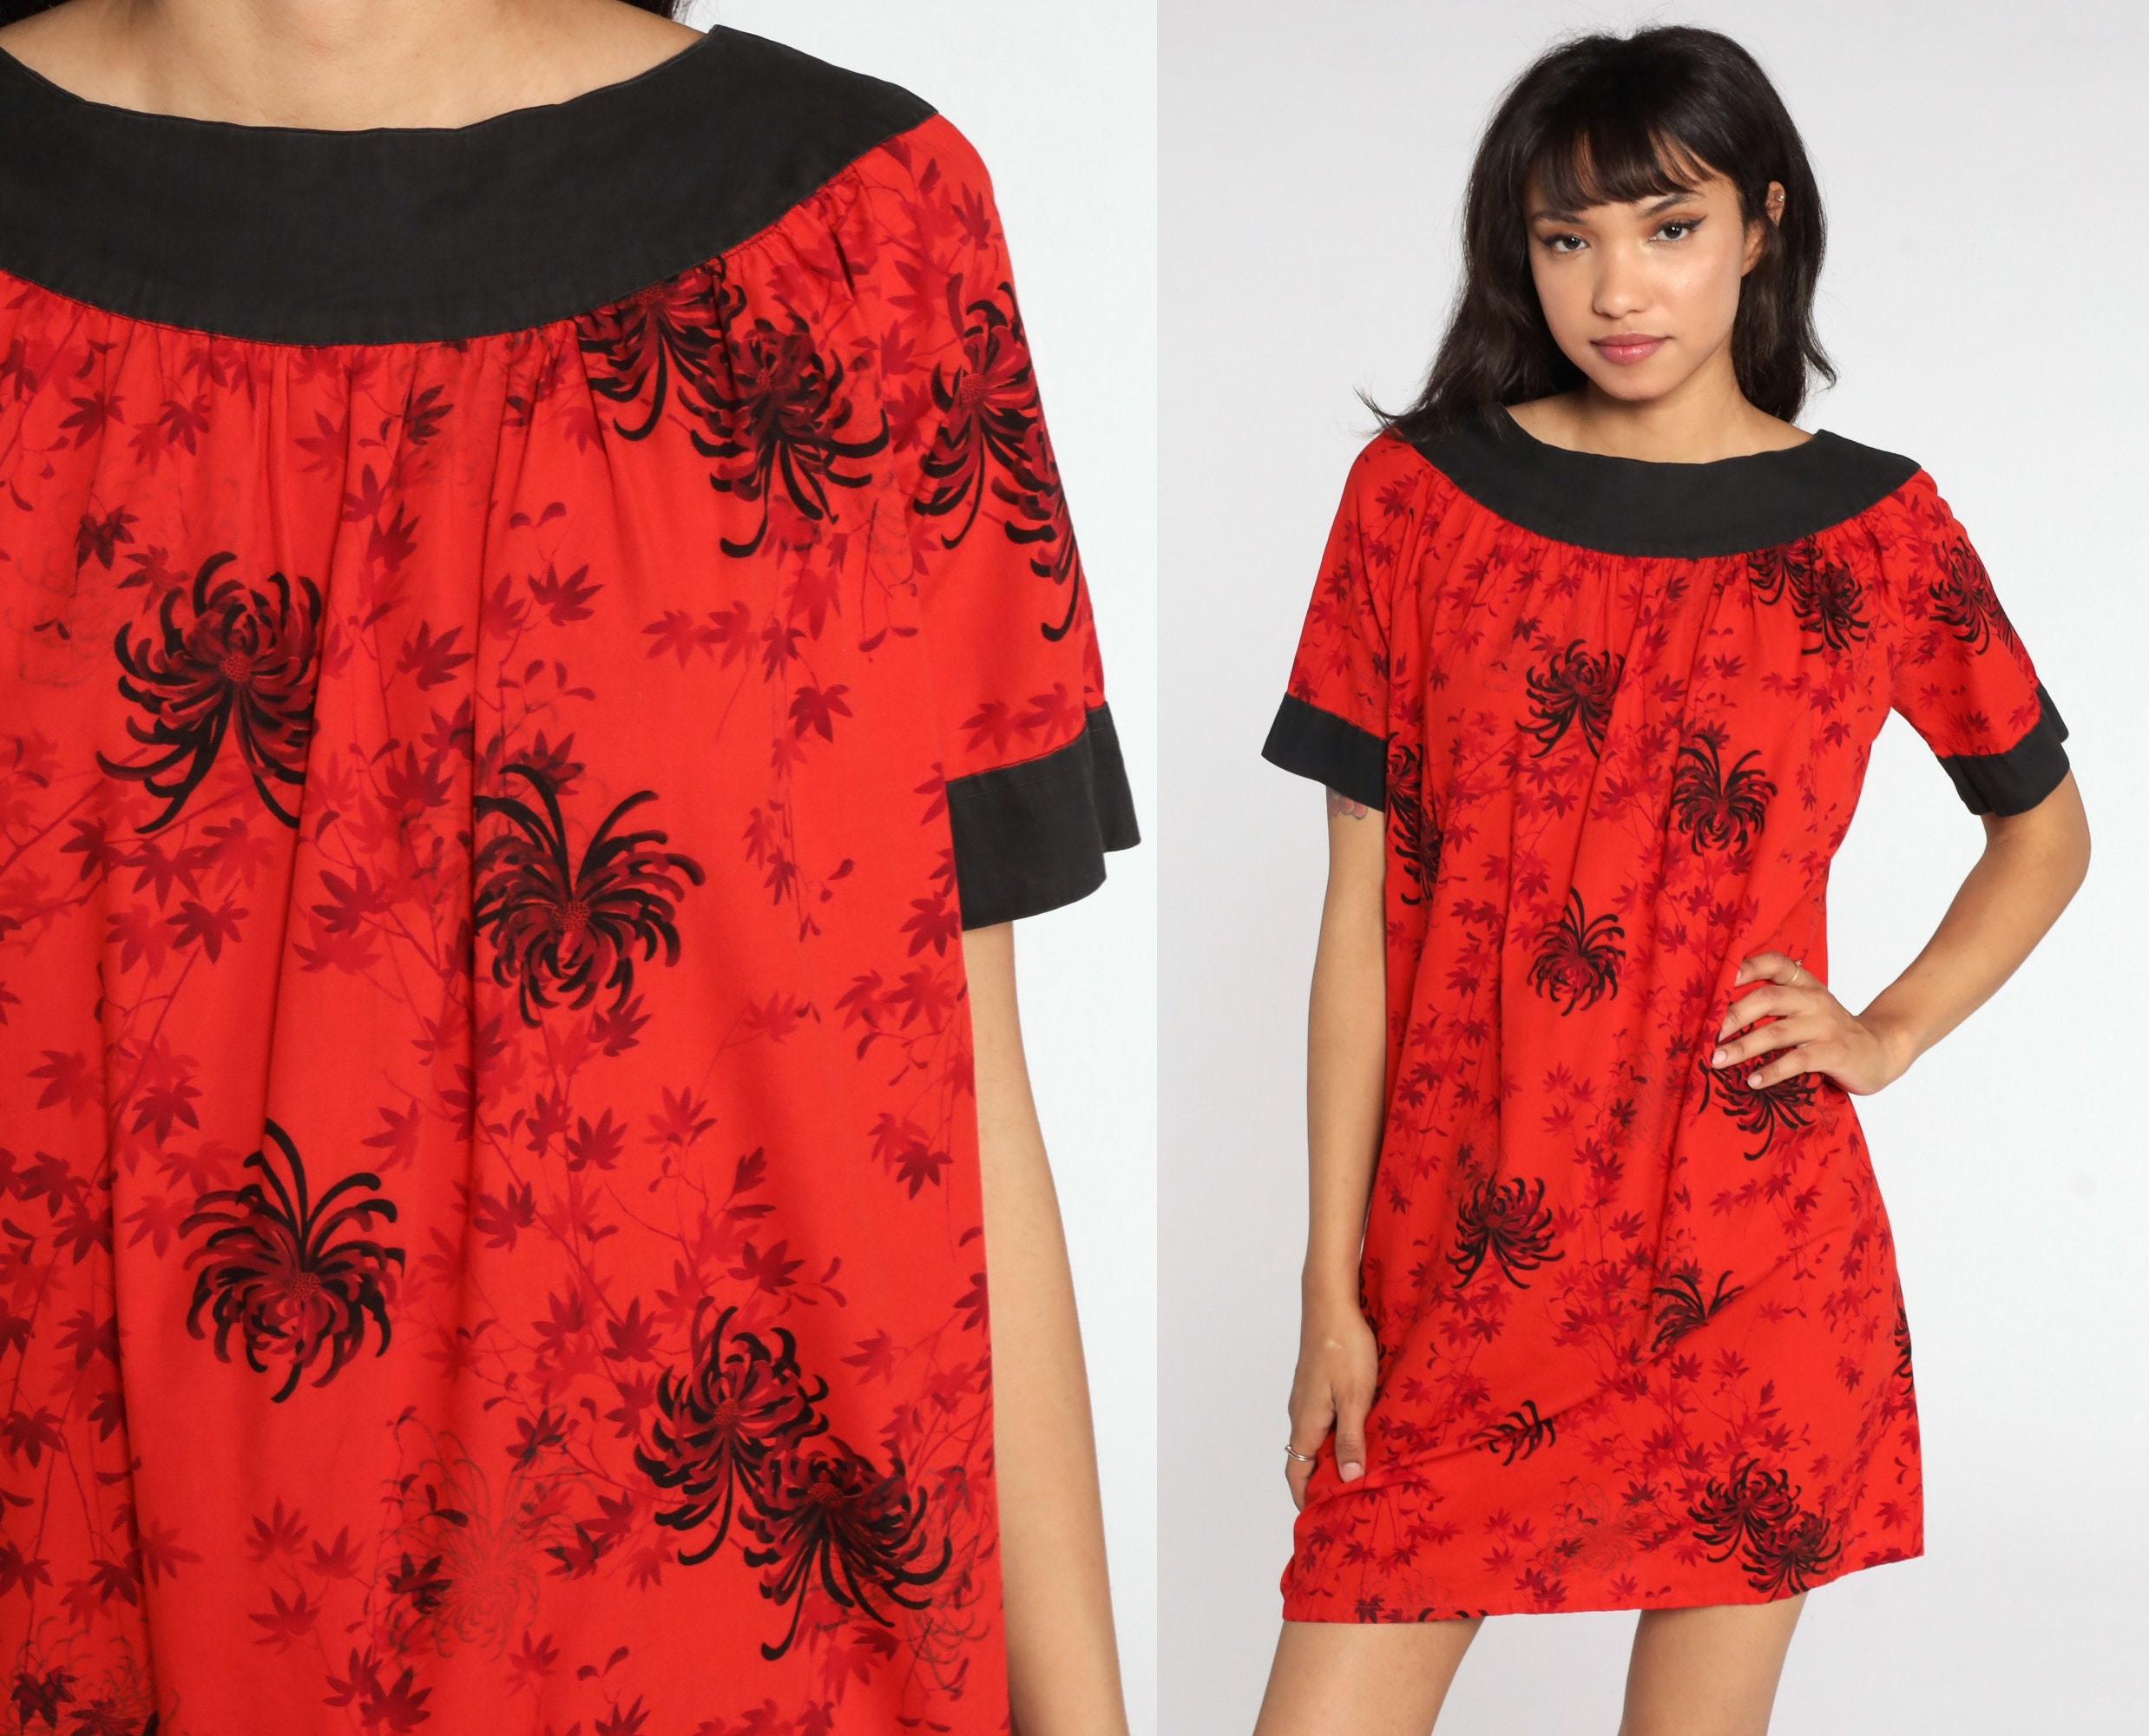 80s Dresses | Casual to Party Dresses Floral Mini Dress Black Red Tent Tropical Boho 80S Bohemian Vintage 1980S Retro Trapeze Short Sleeve Large $44.00 AT vintagedancer.com